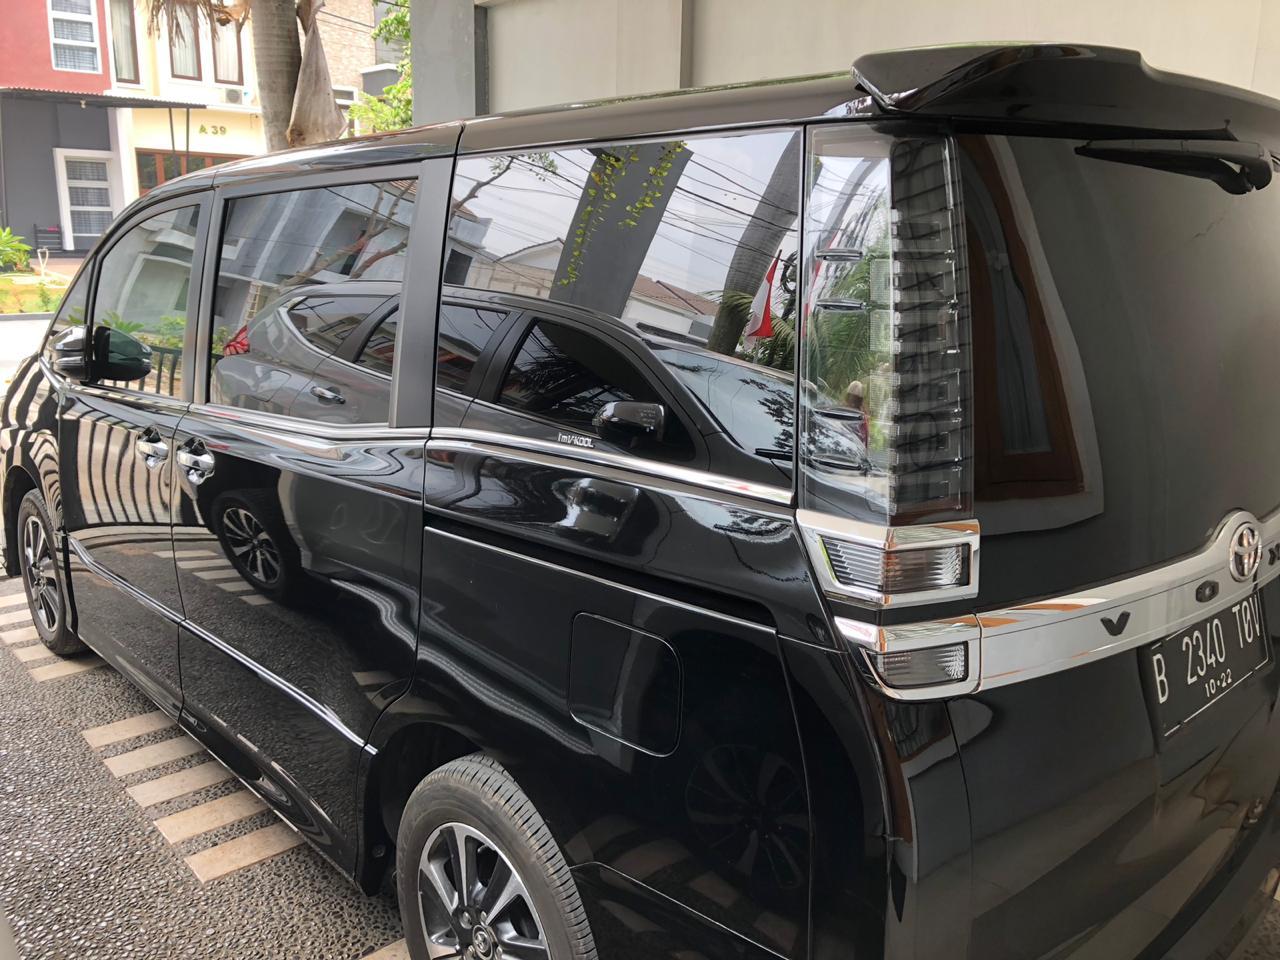 Kelebihan Harga Mobil Toyota Voxy Harga